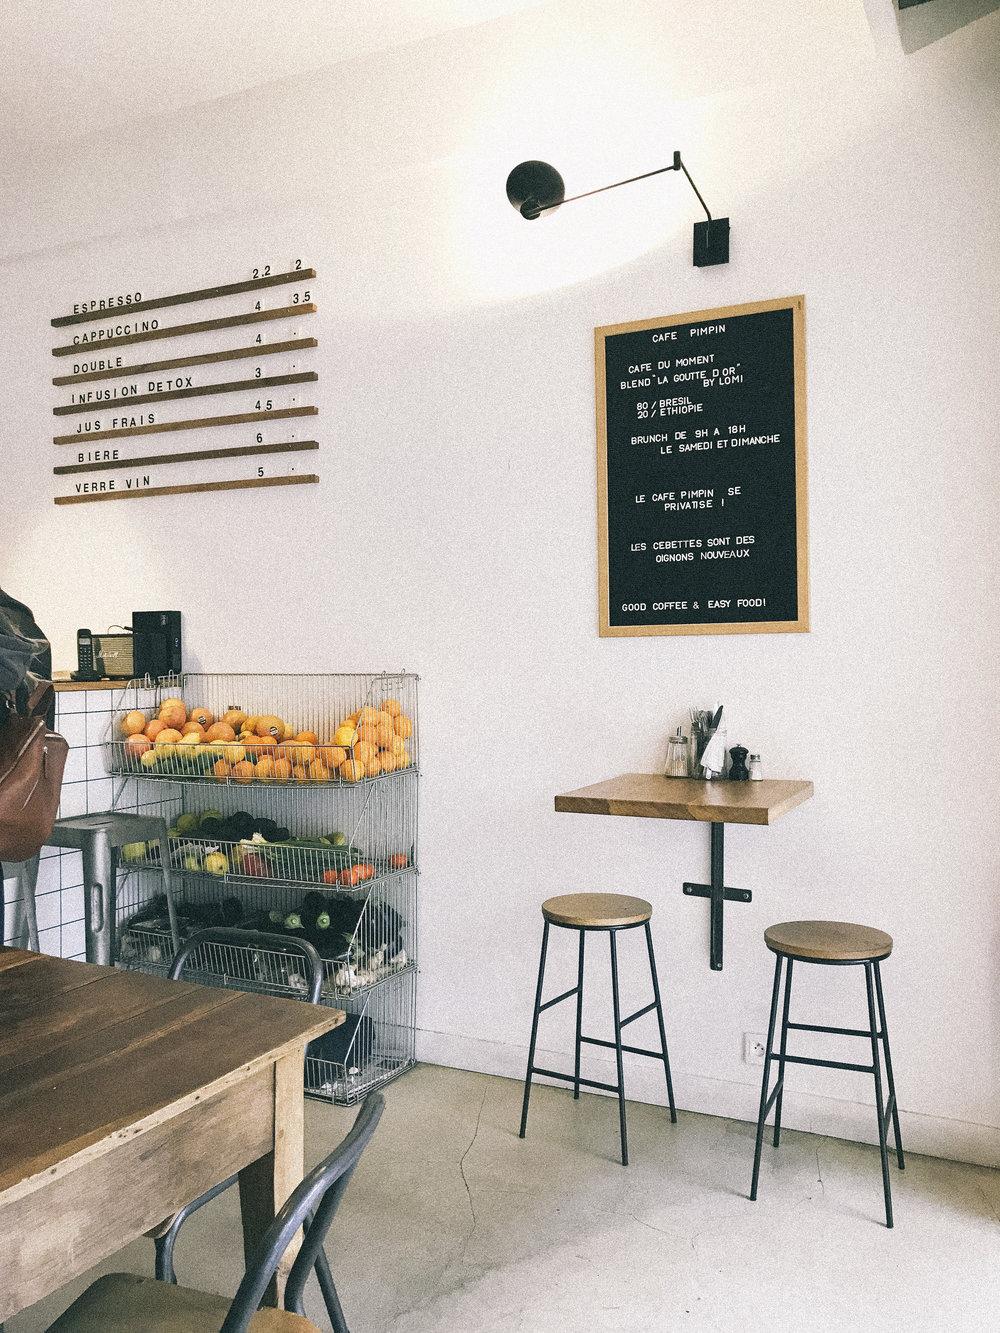 Cafè:  BlackBurn Coffee